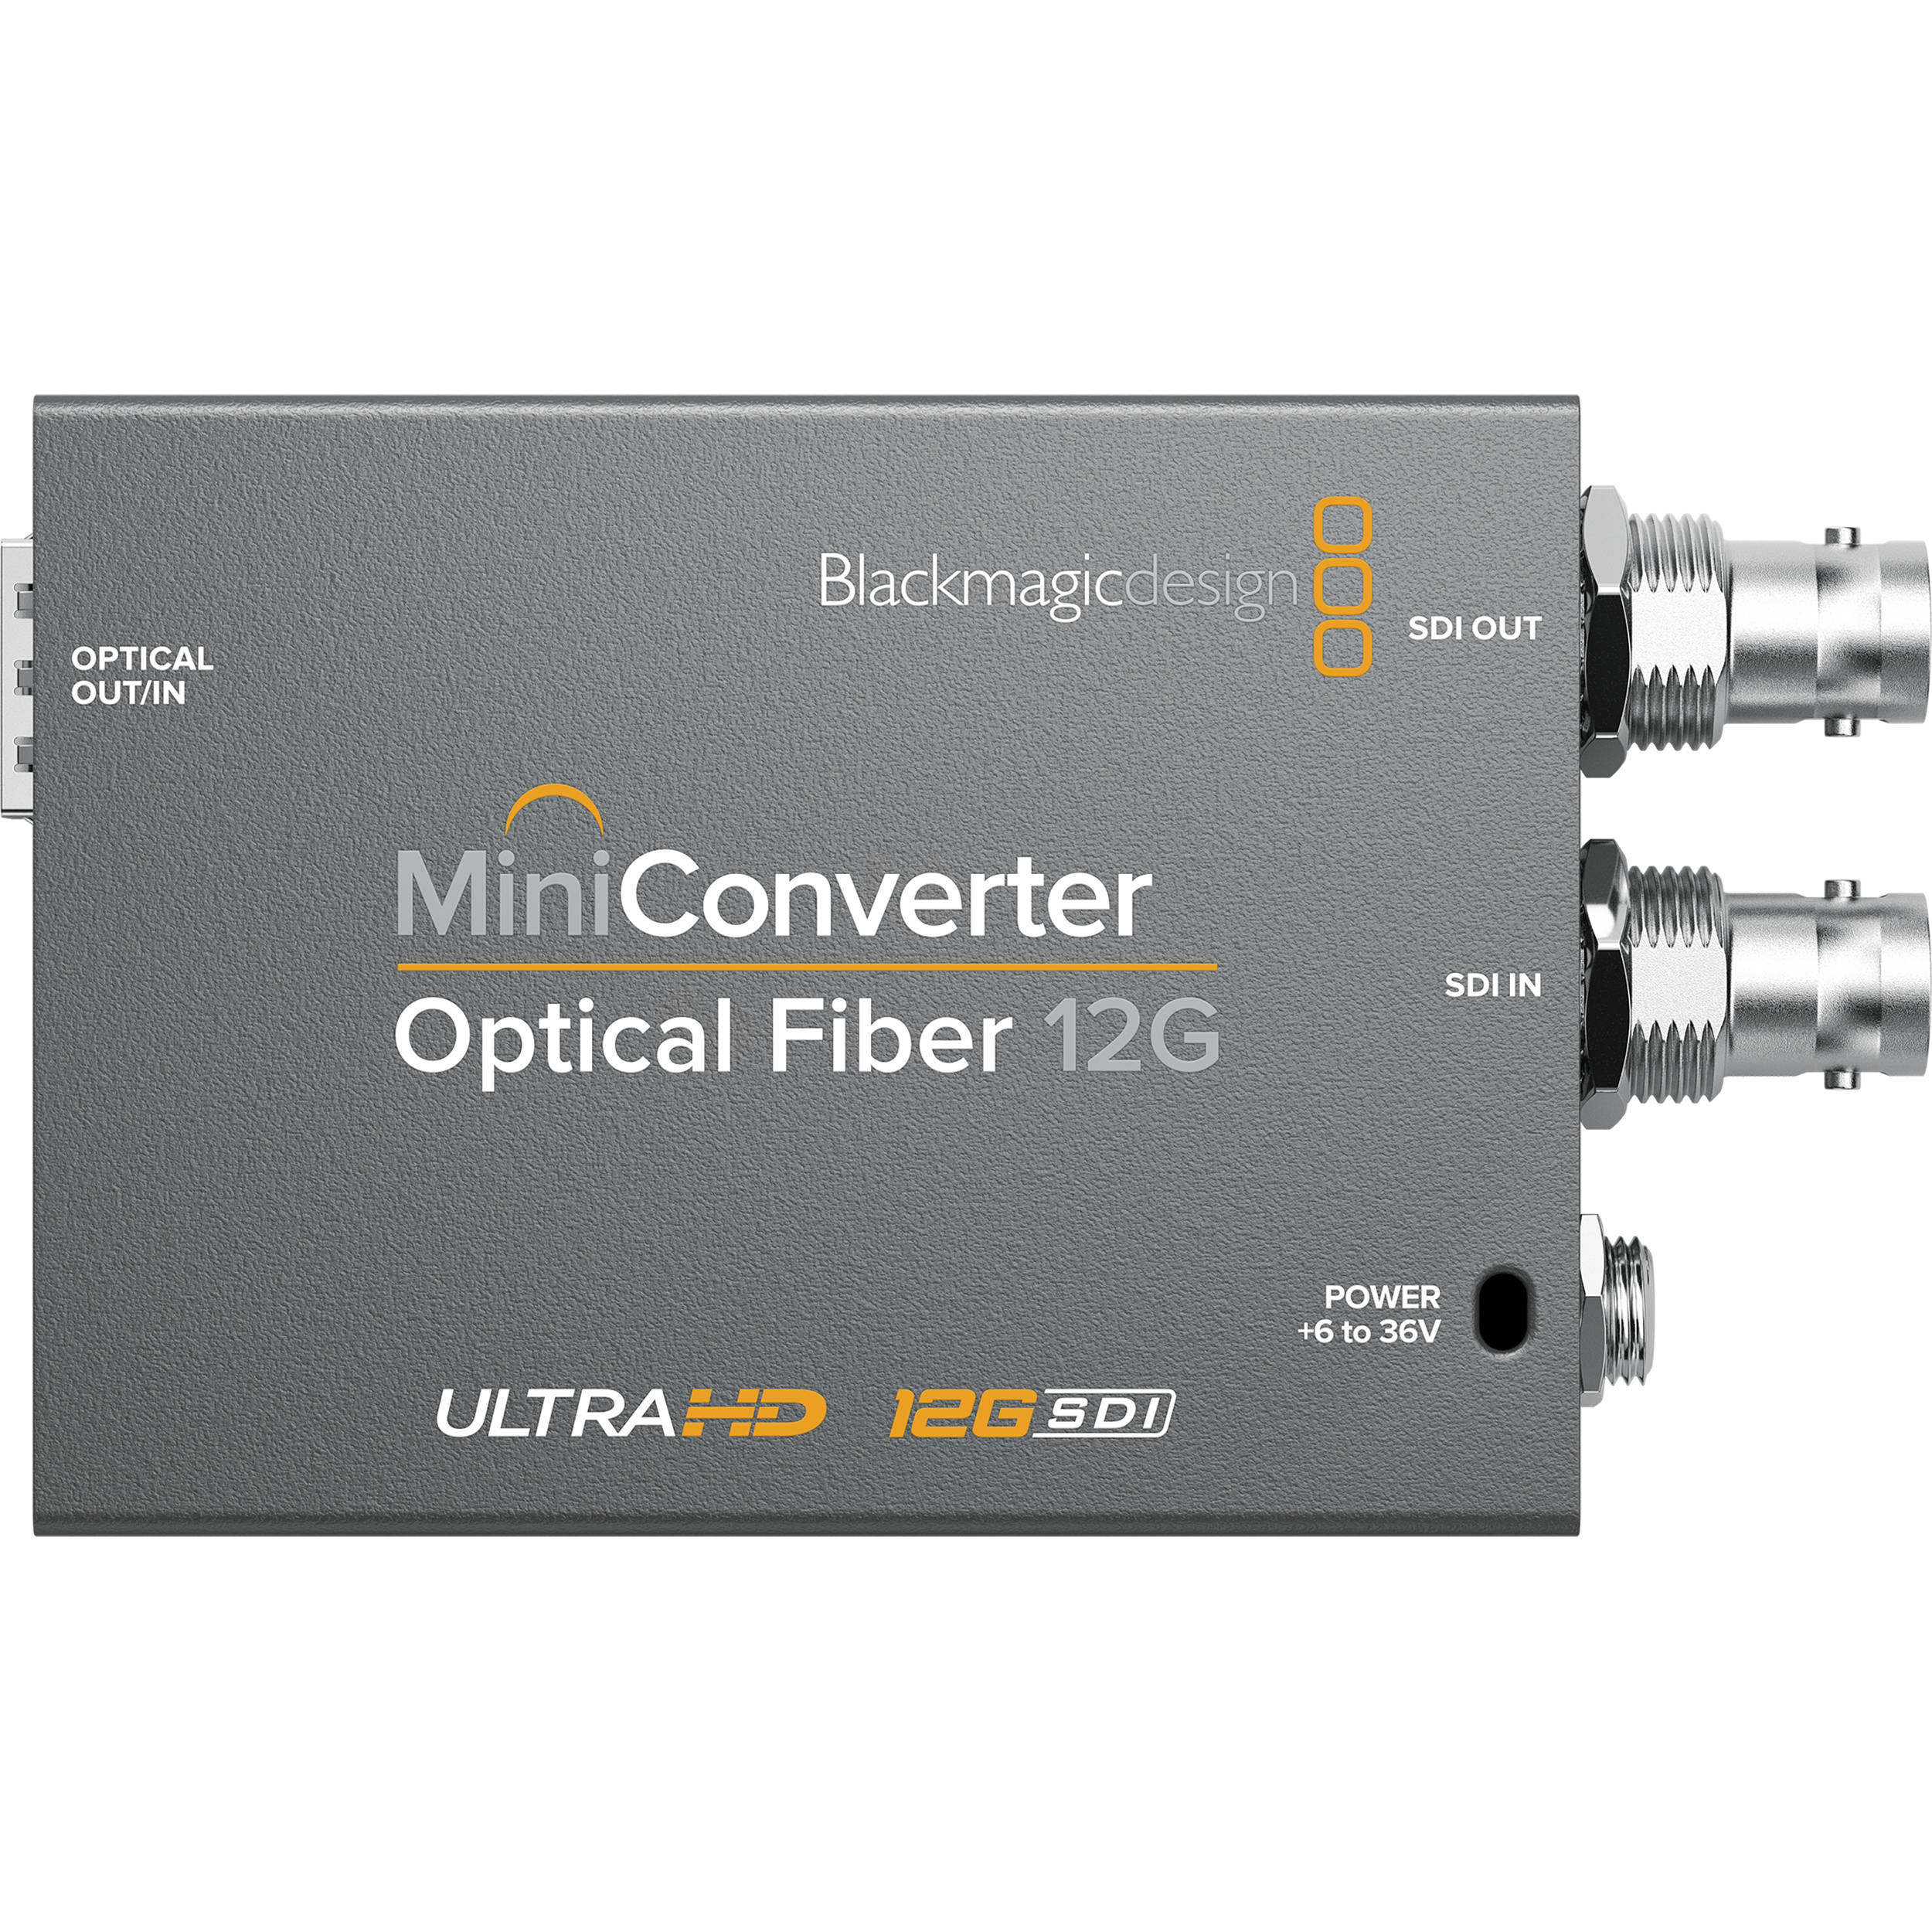 Blackmagic Design Mini Converter Optical Fiber 12g Sdi